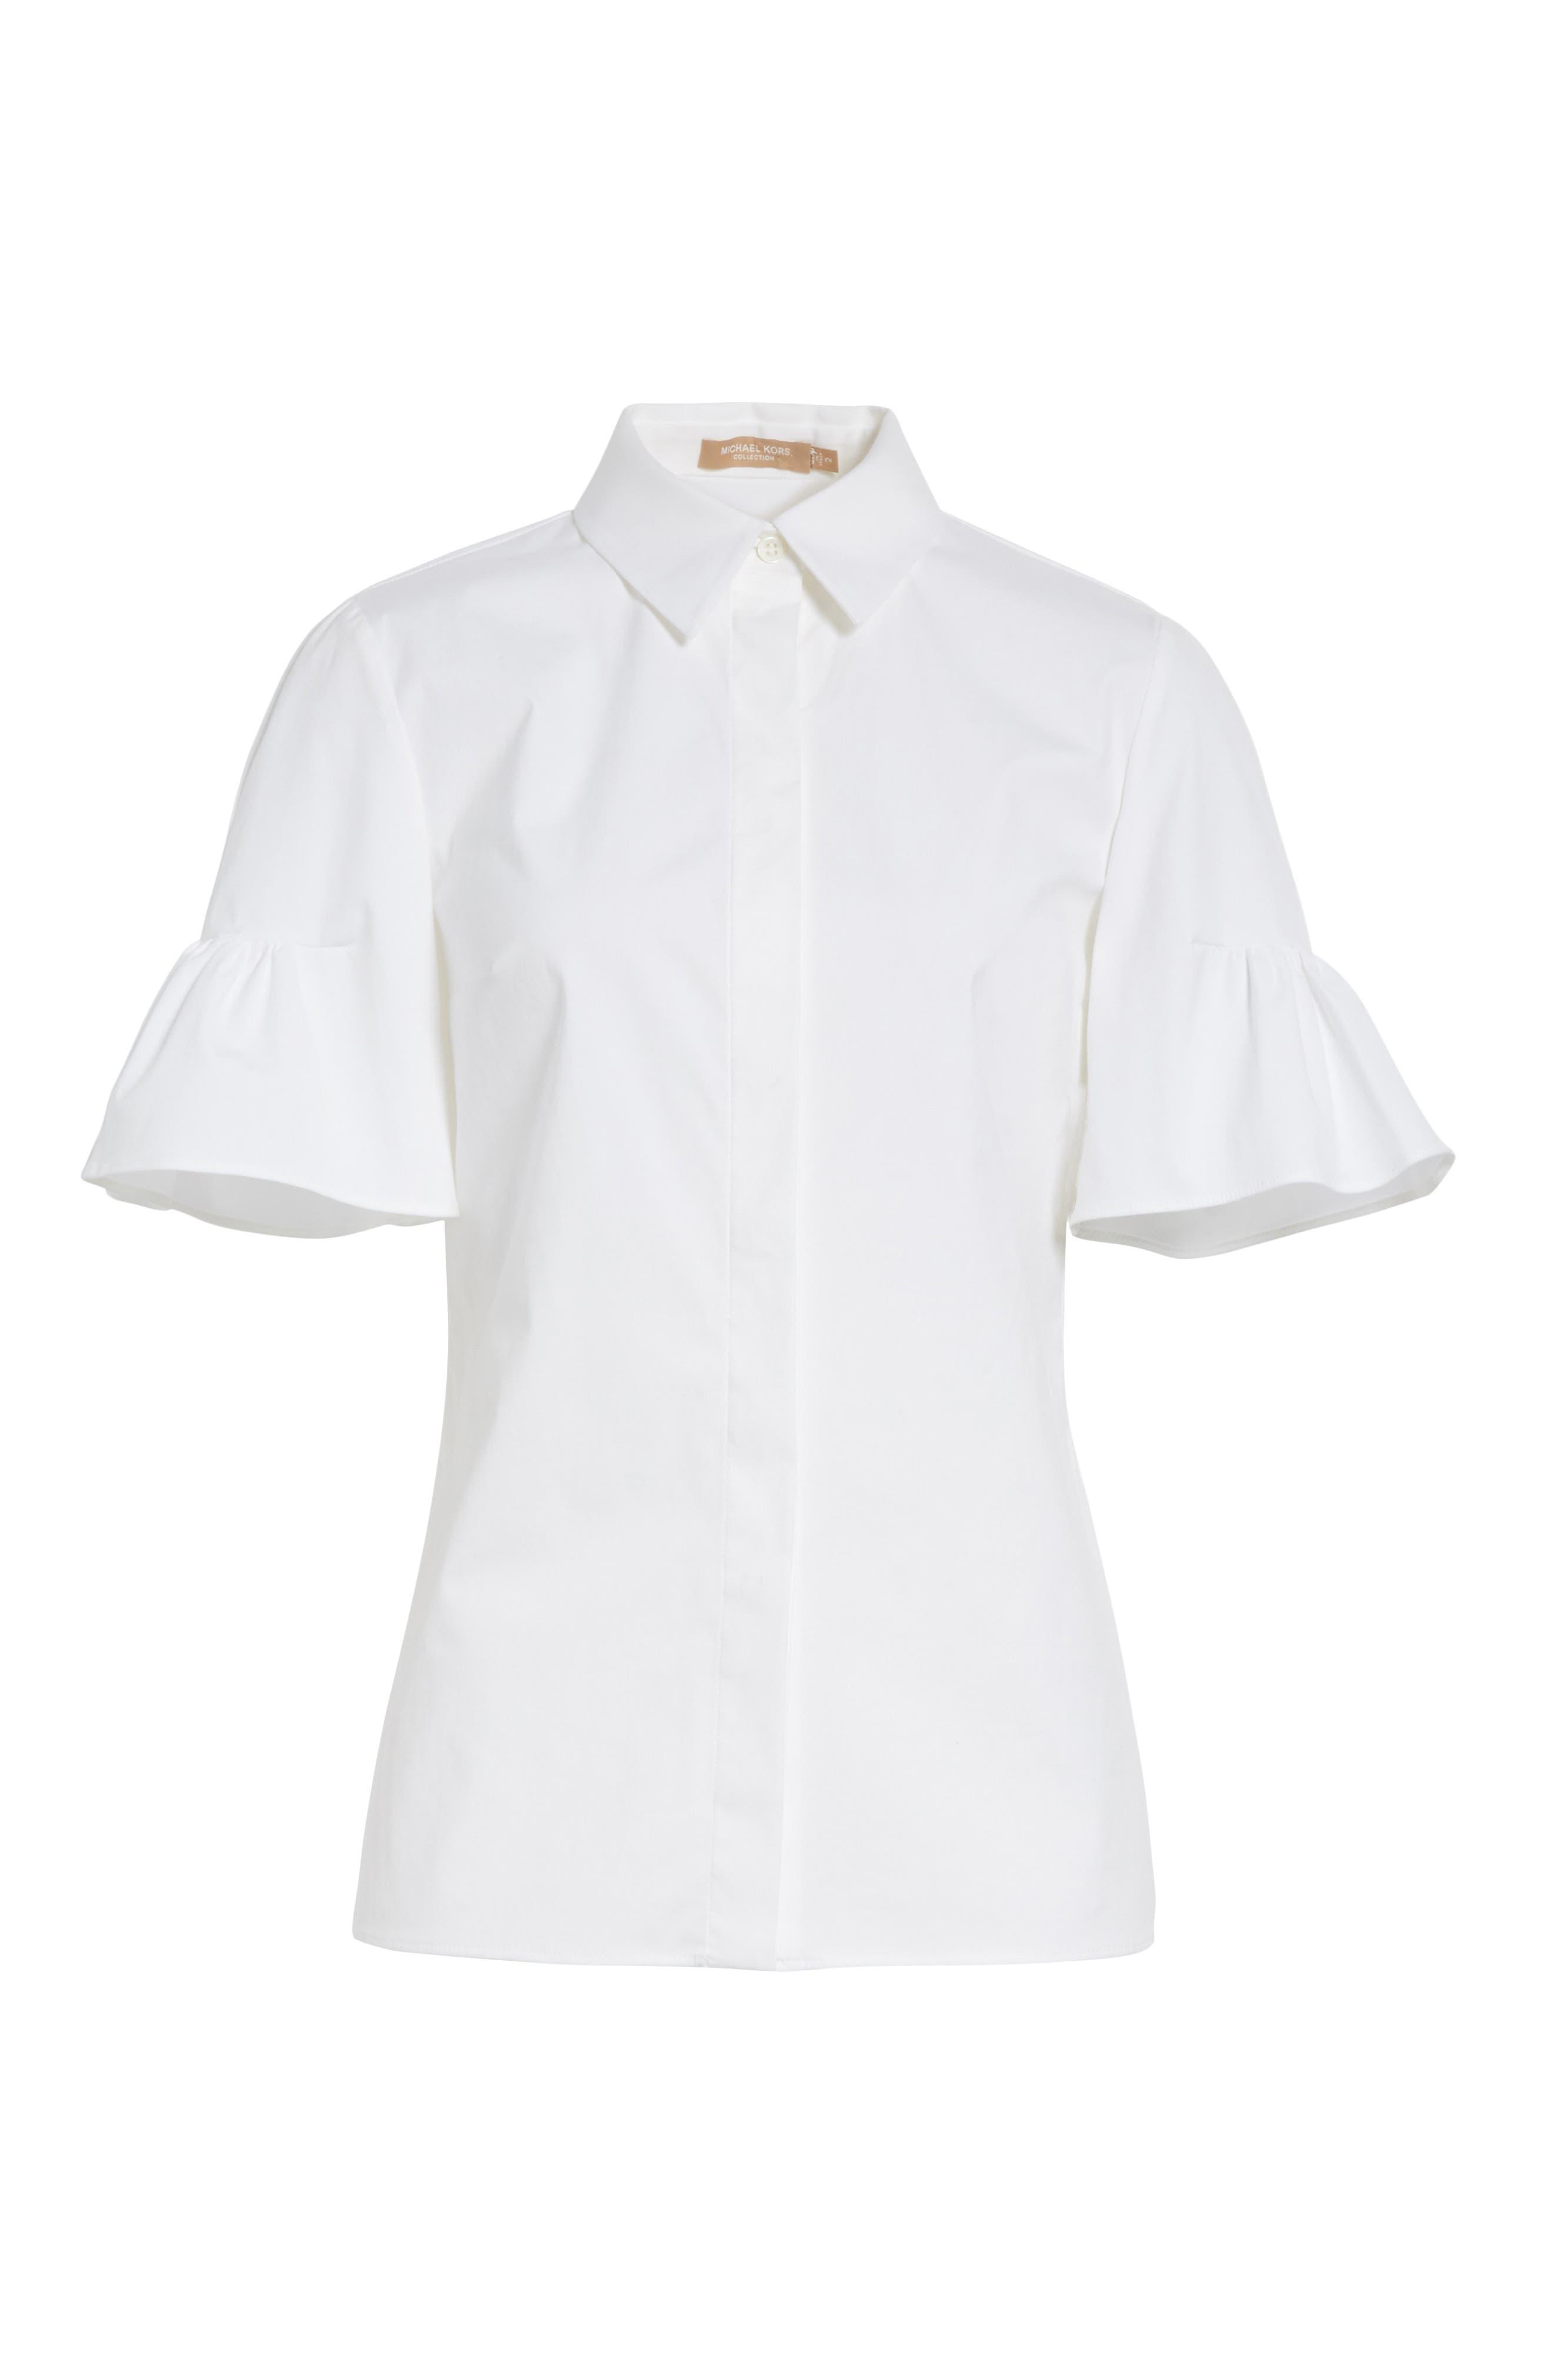 Bell Sleeve Shirt,                             Alternate thumbnail 6, color,                             100